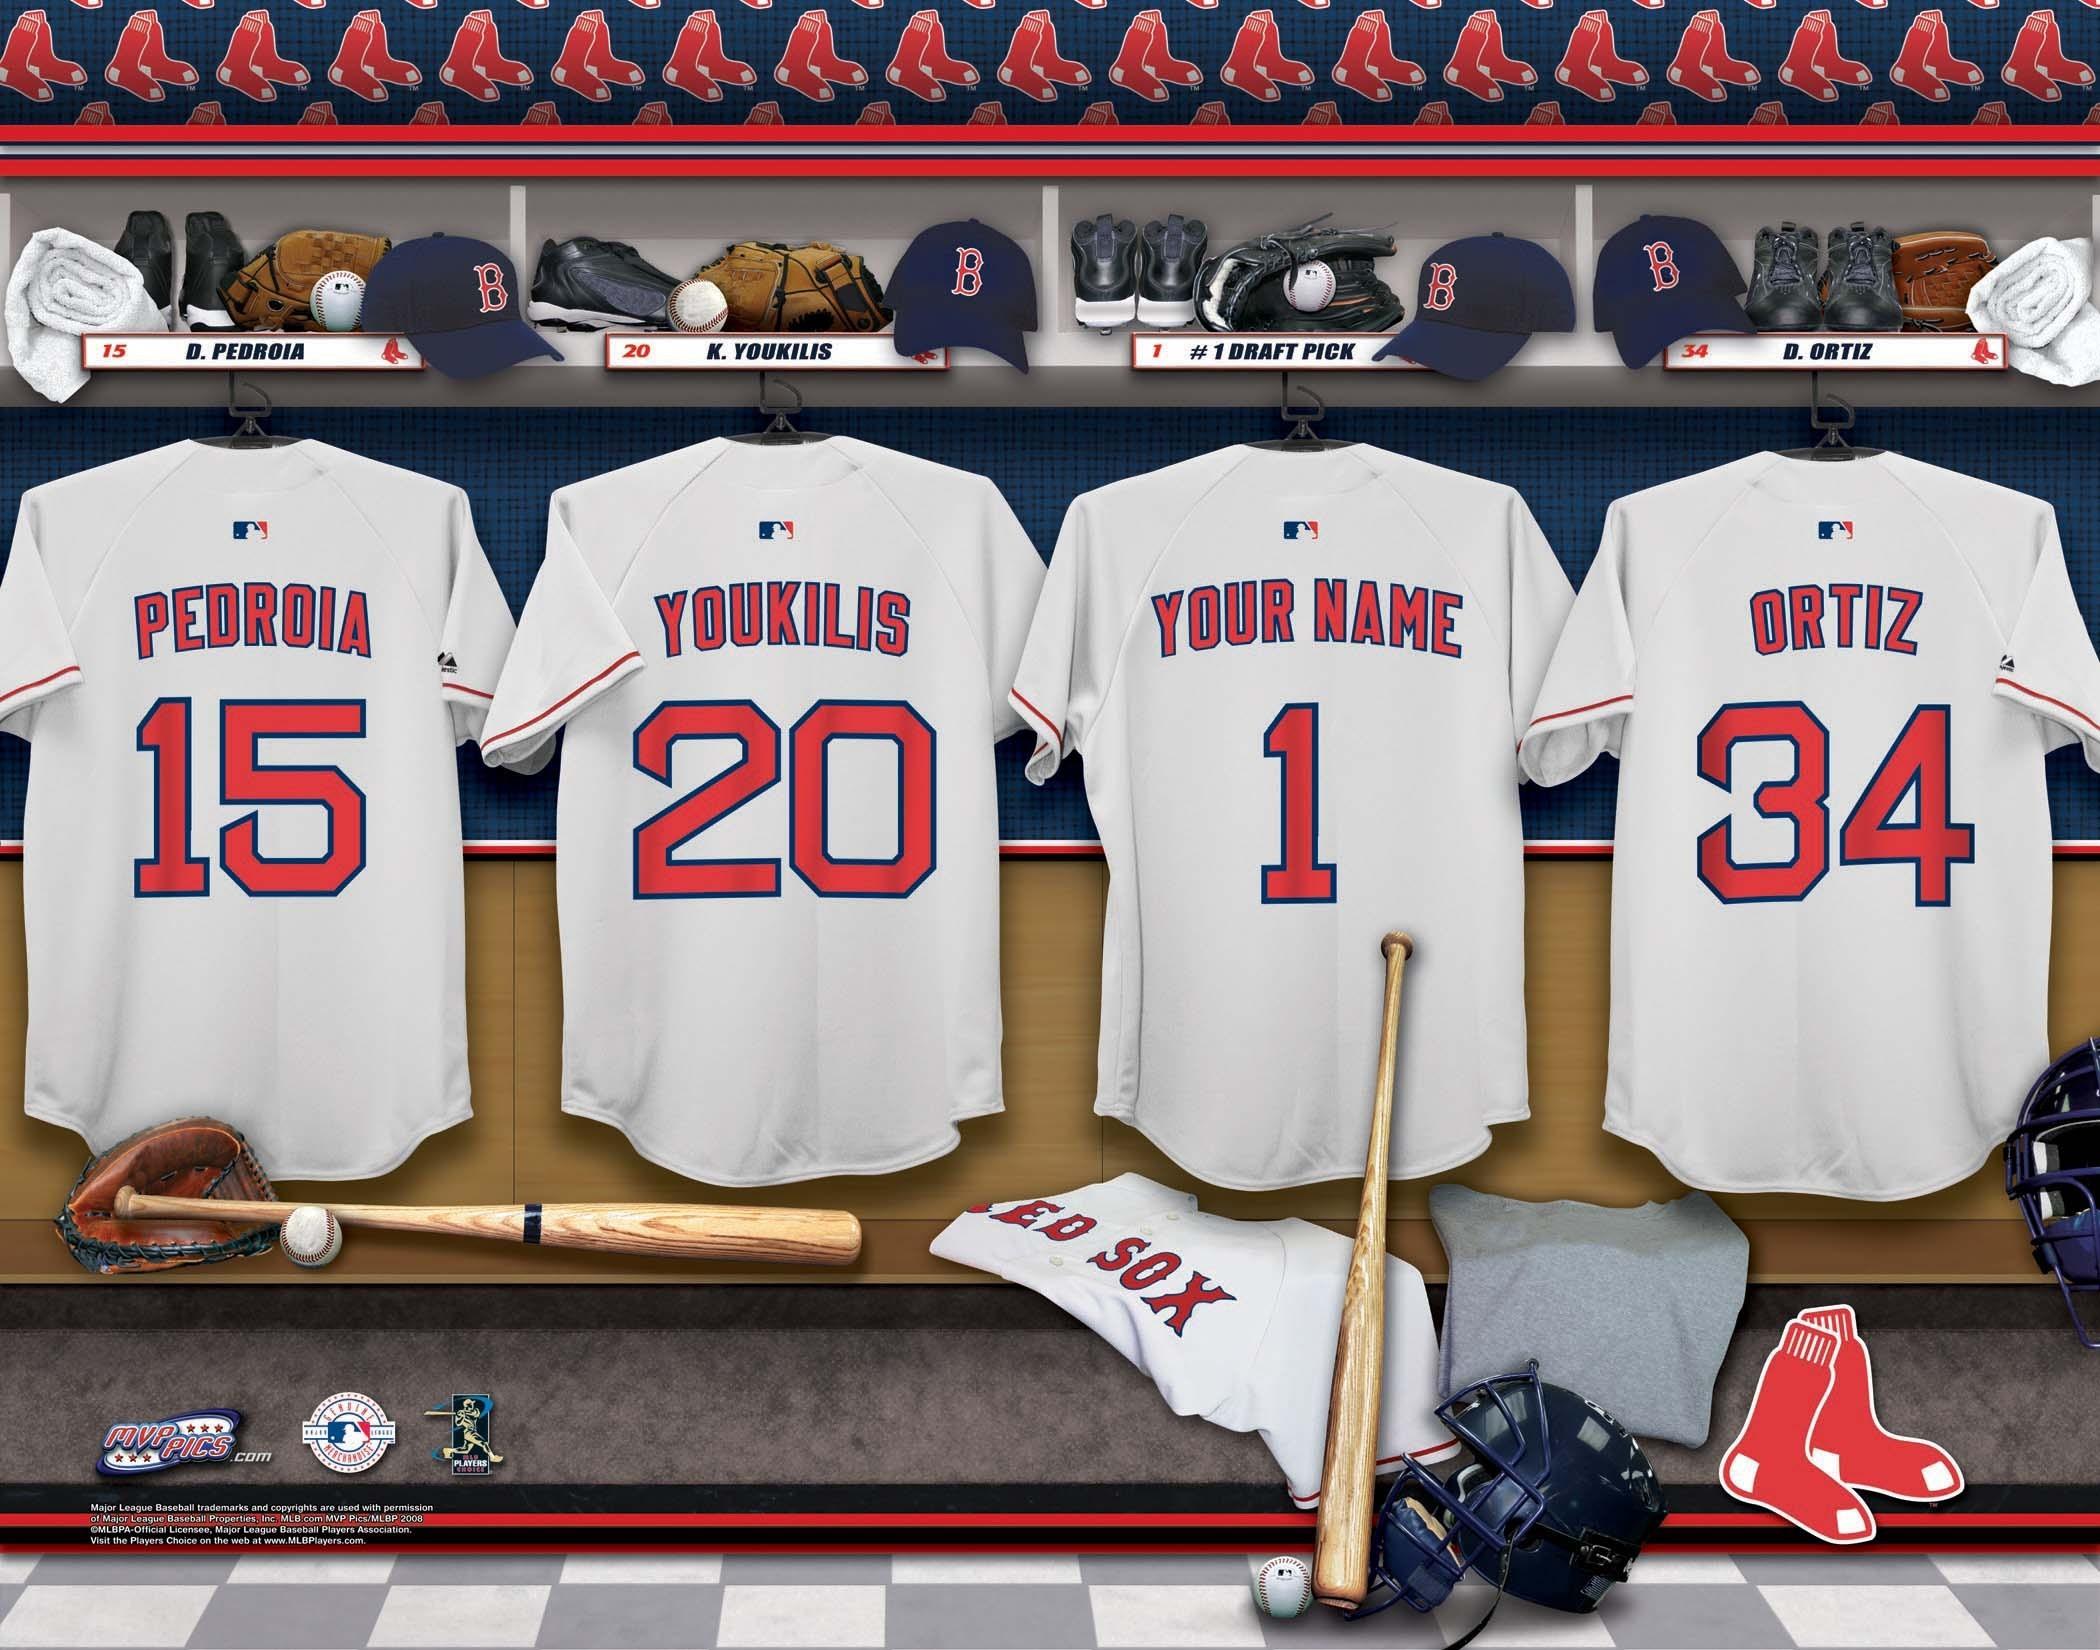 boston red sox baseball wallpaper backgrounds hd